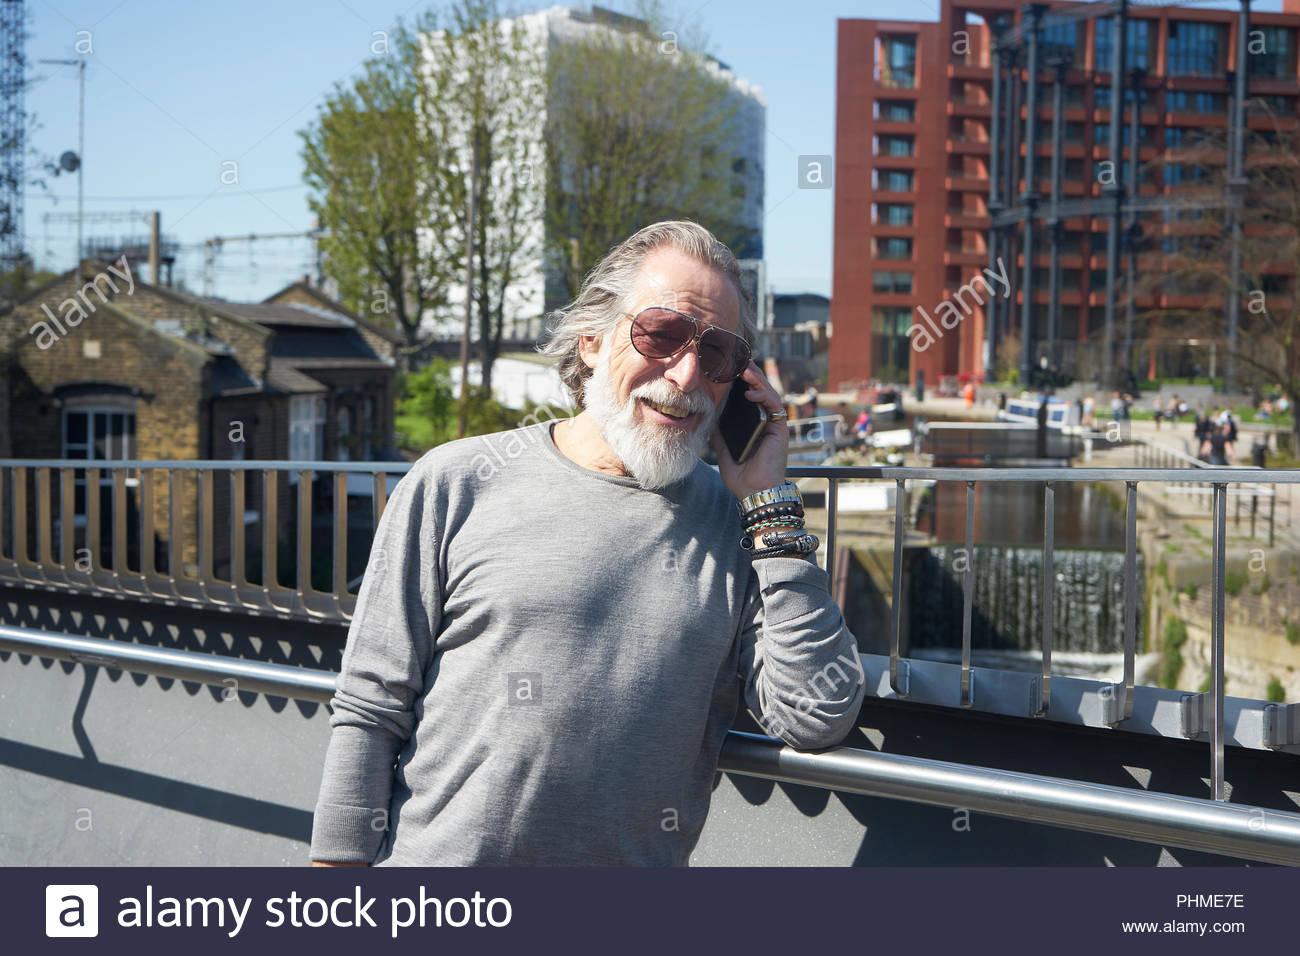 Senior man on phone call - Stock Image